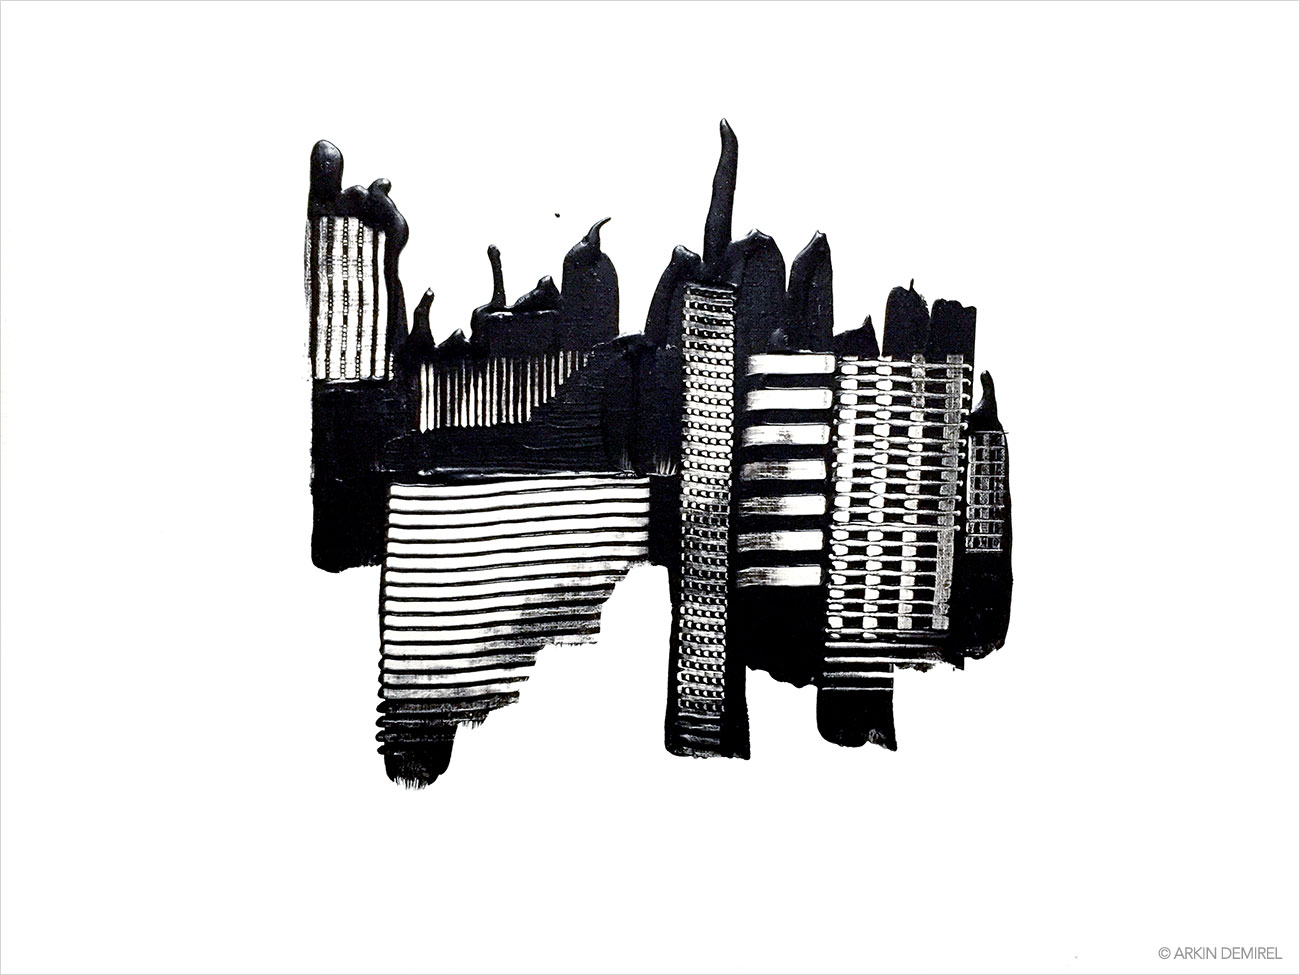 City n°8